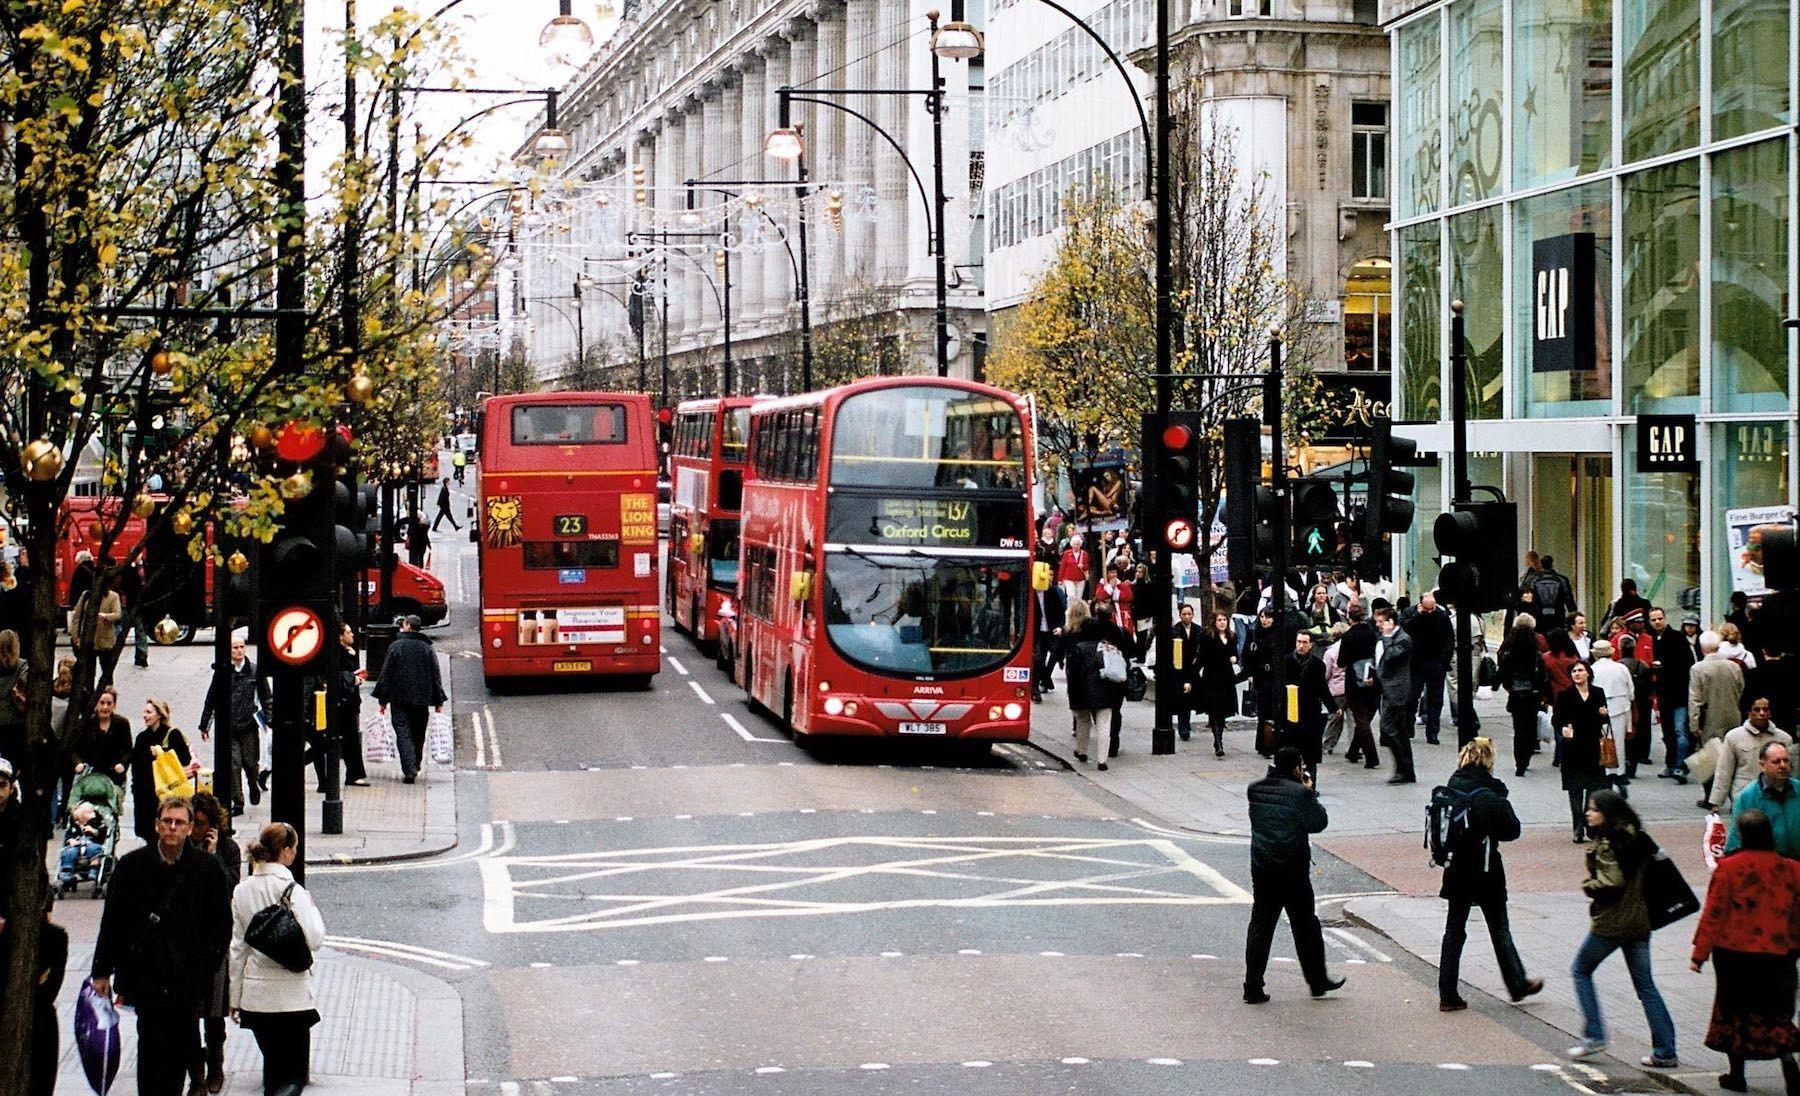 avrupa rüyası londra Oxford Street